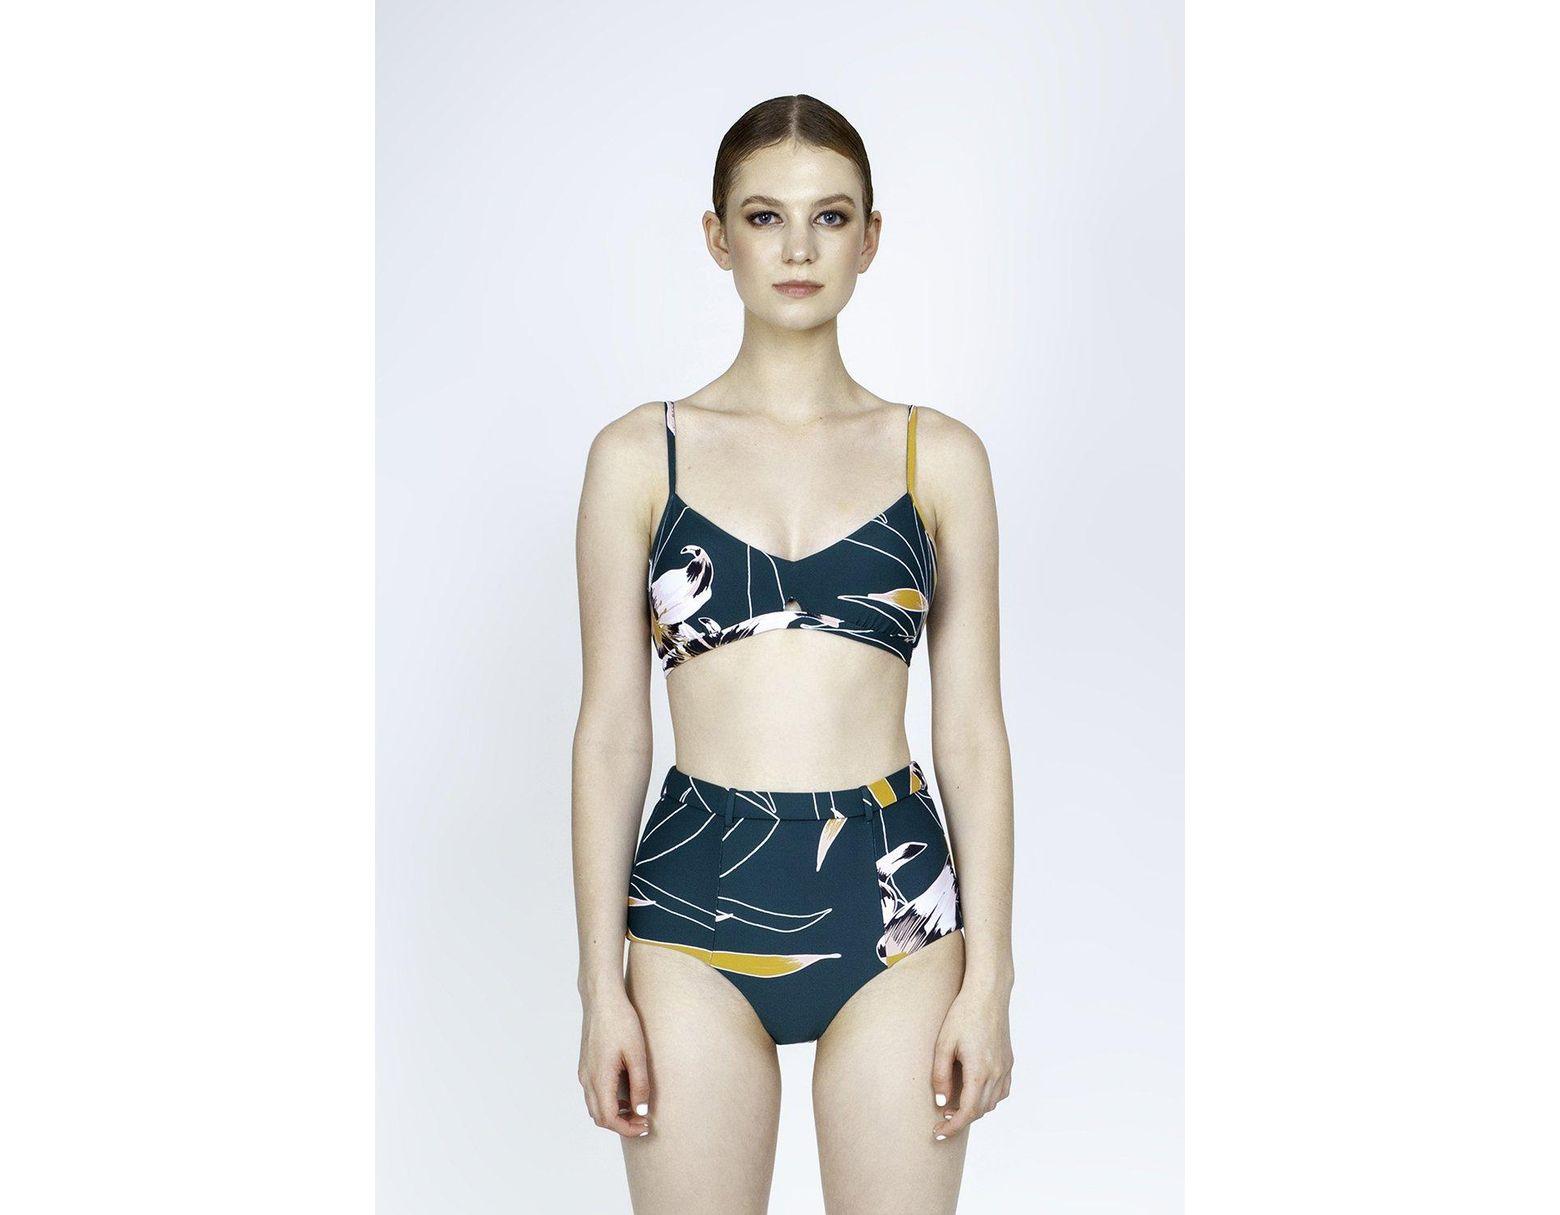 c238001b2e689 Seafolly Aralia Belted High Waist Bikini Bottom - Emerald Floral Print in  Green - Lyst